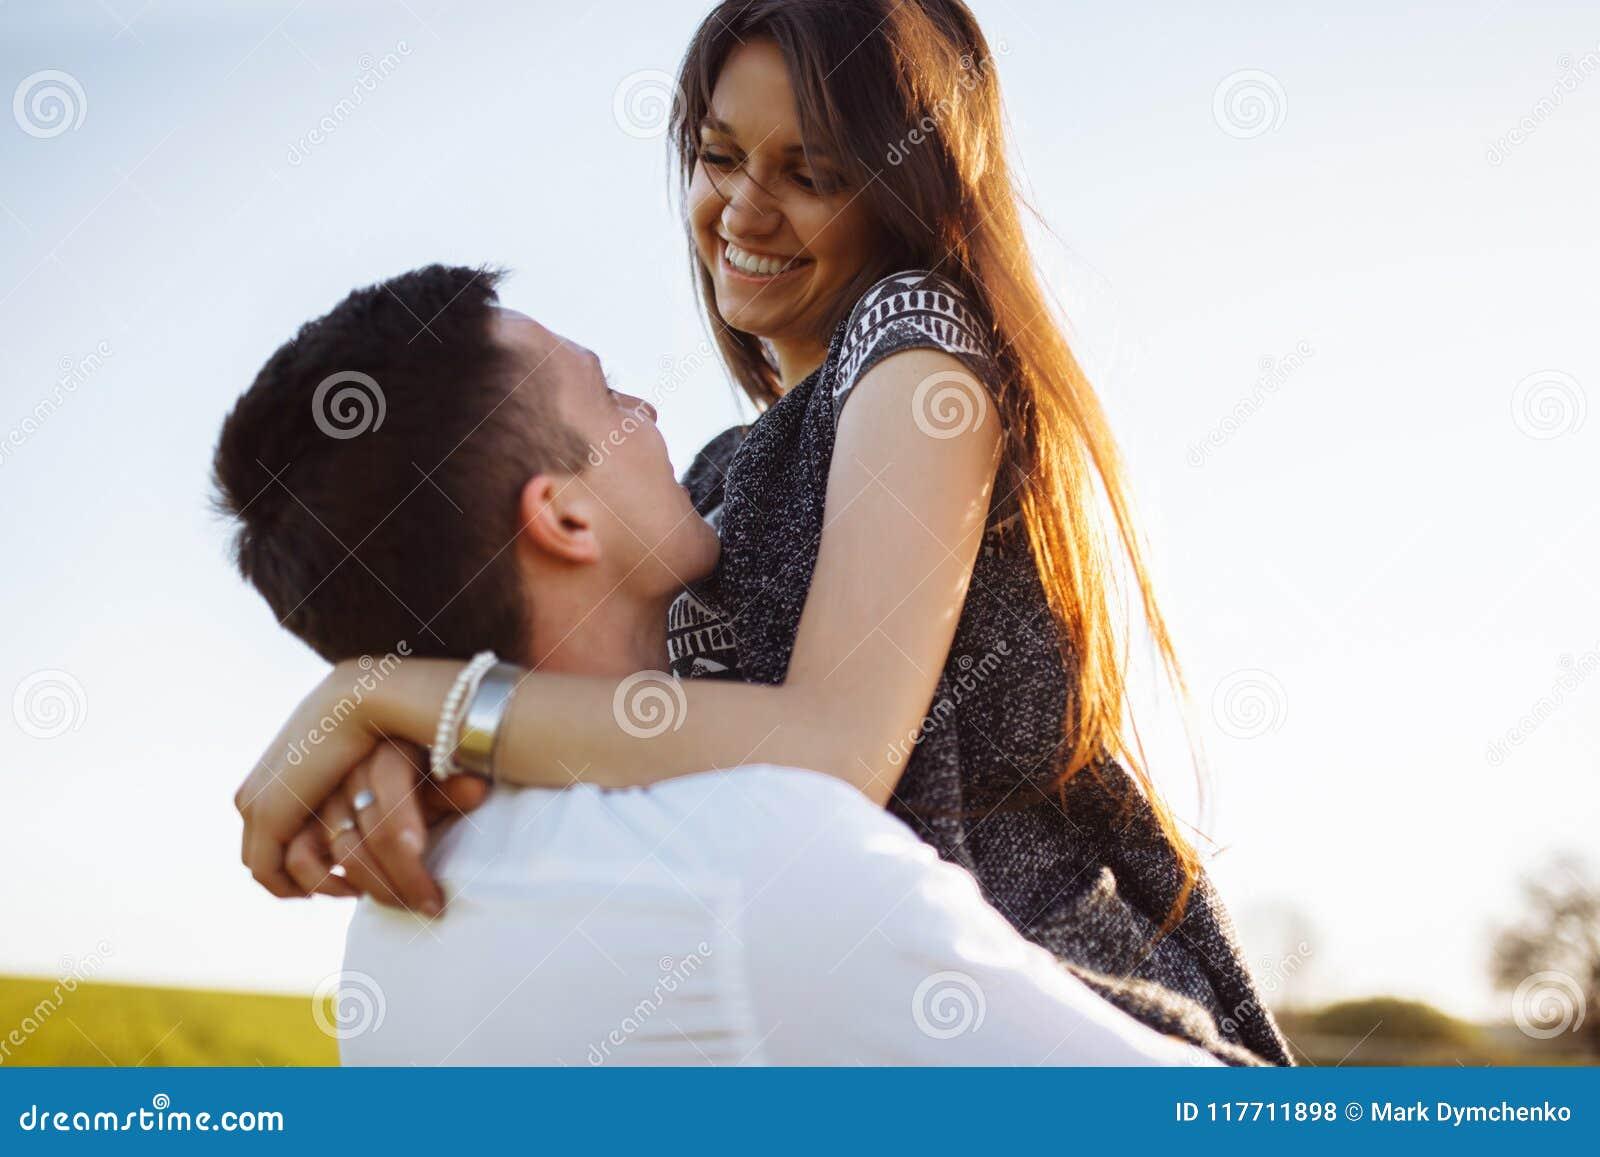 Girls Enjoying Each Other